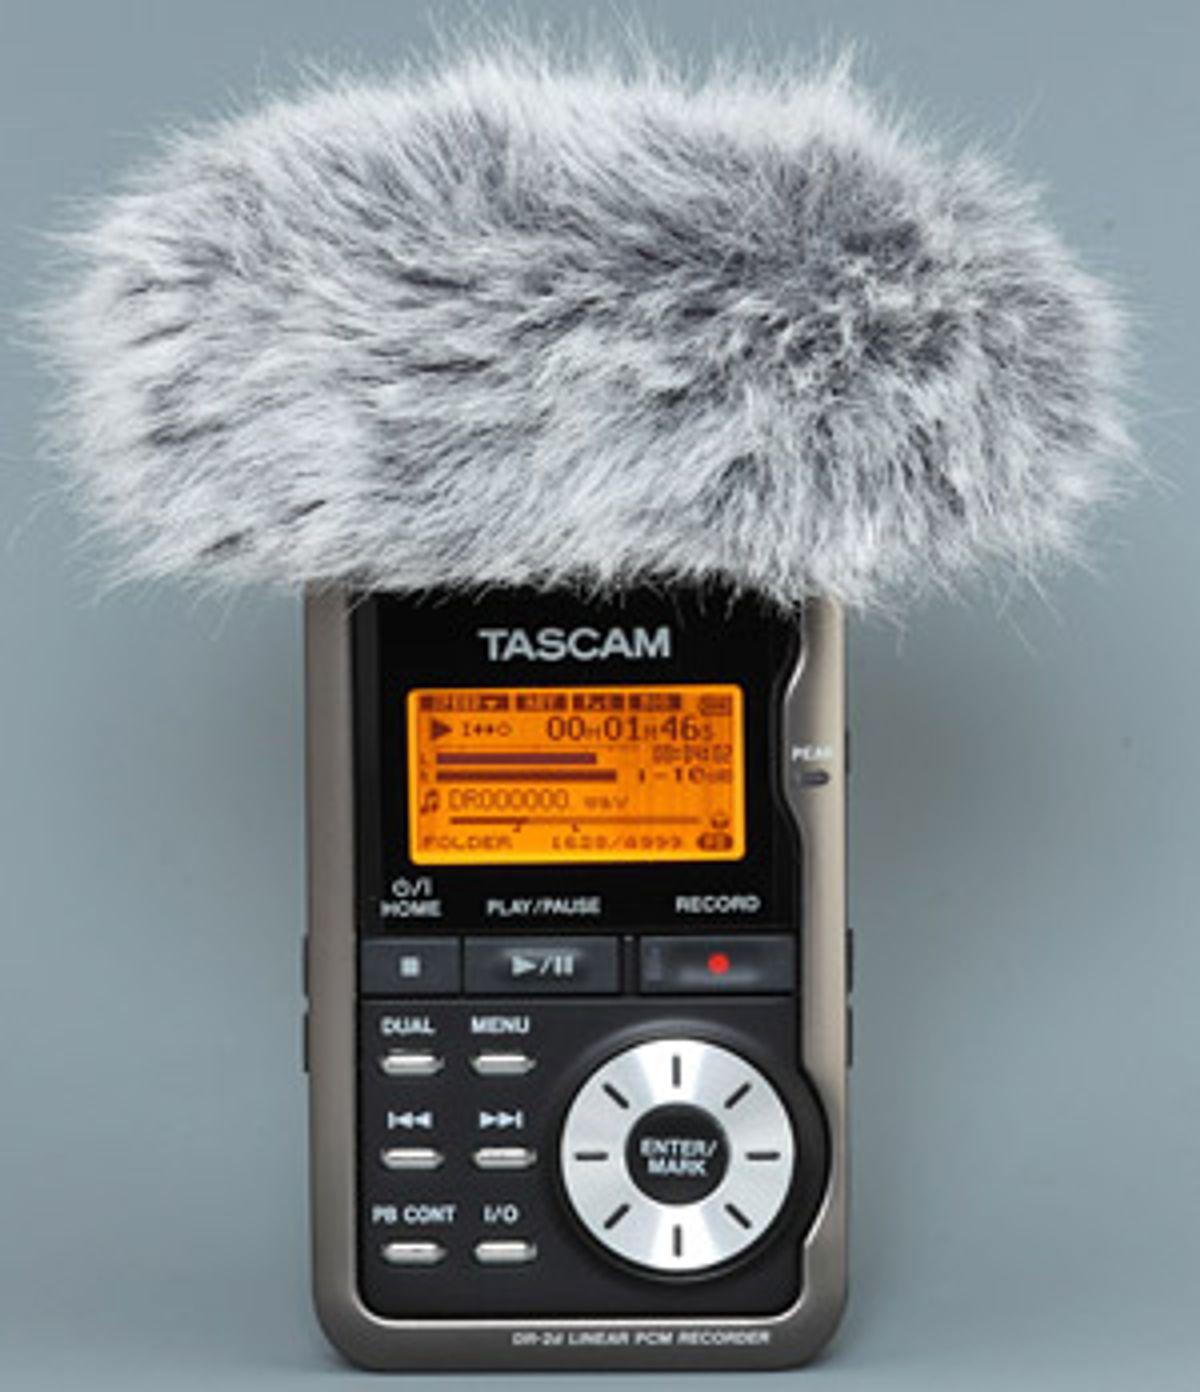 Tascam Releases Digital Recorder Accessories